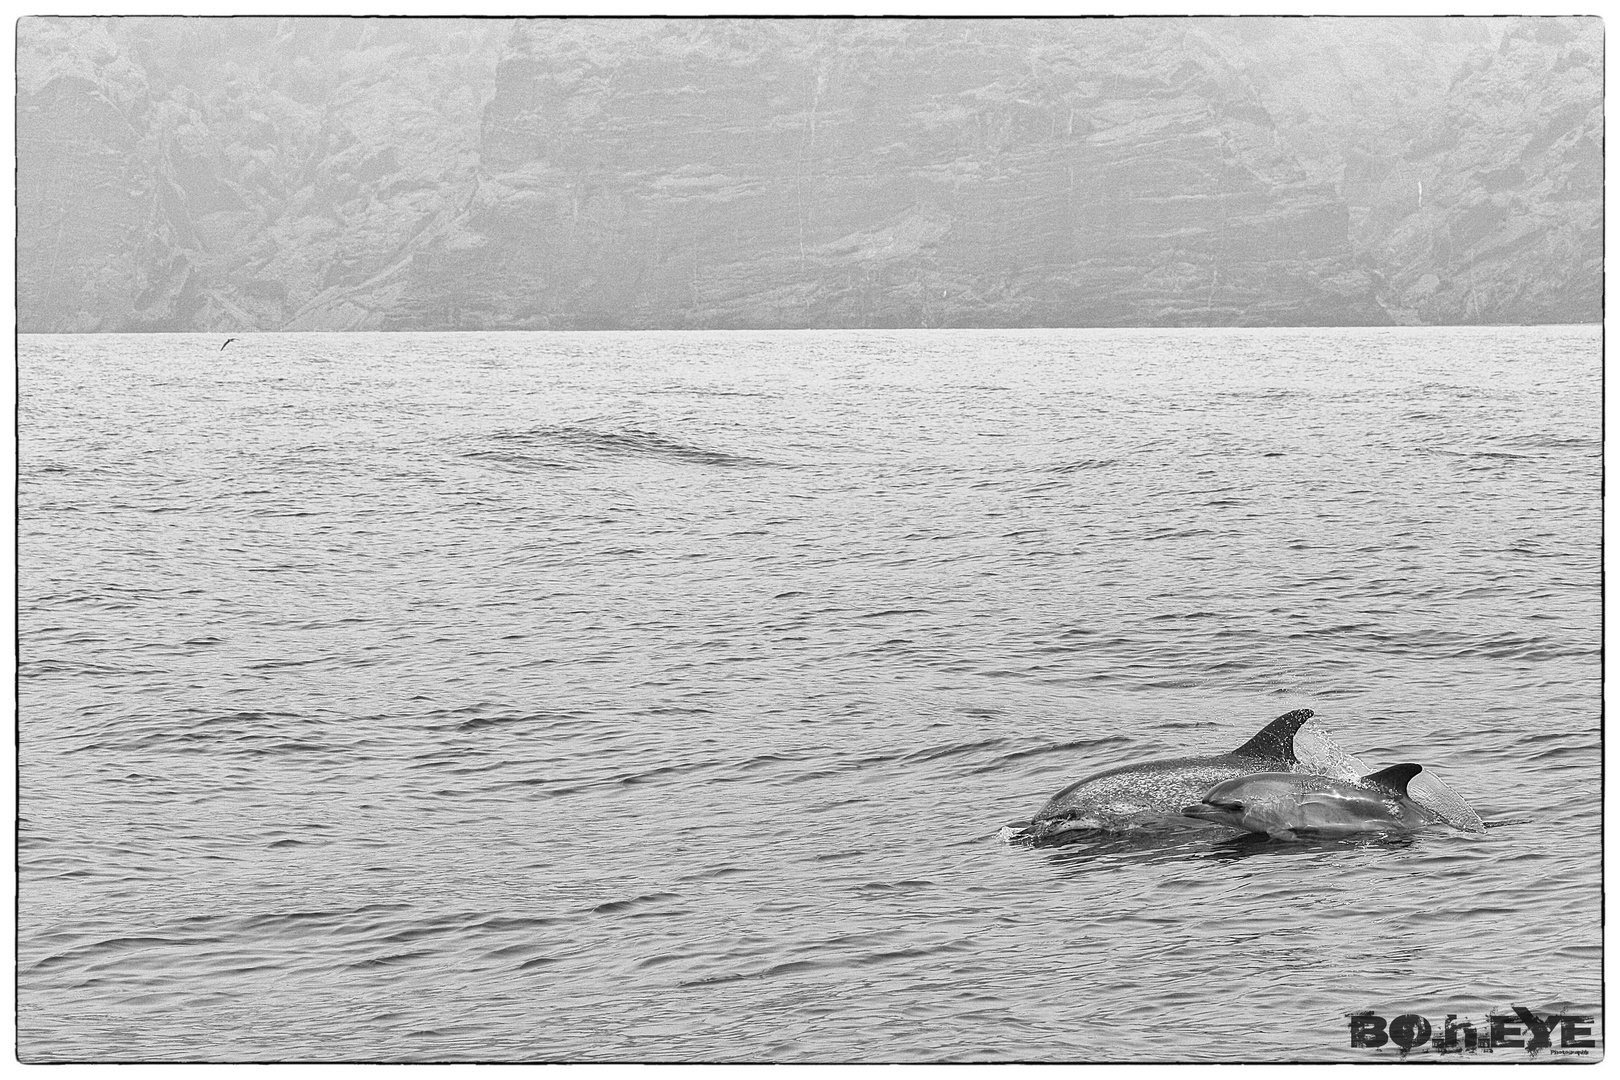 Dolphins @ Teneriffe